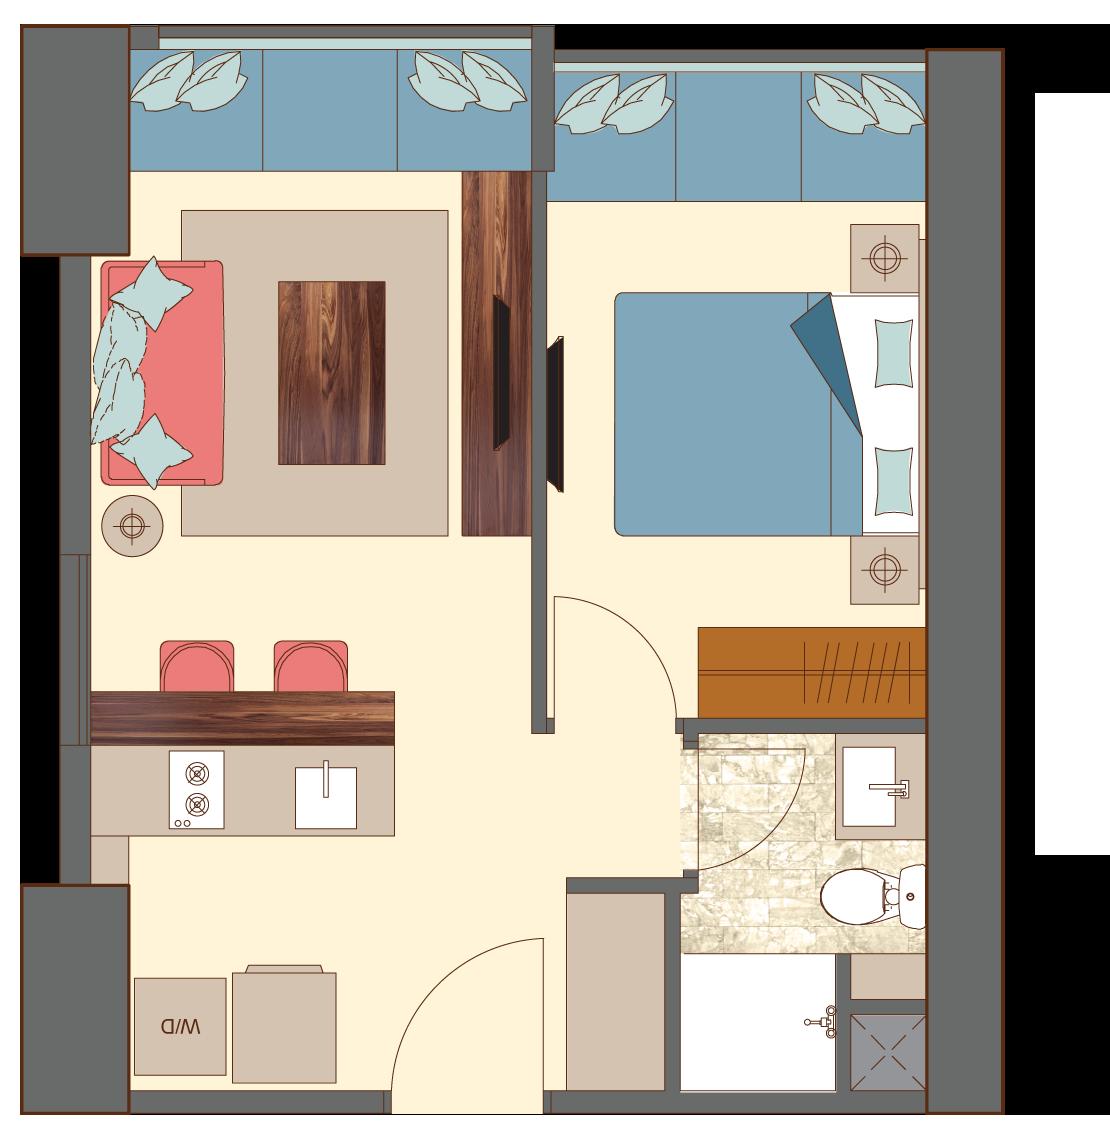 West-2-bedroom-B1 floorplan